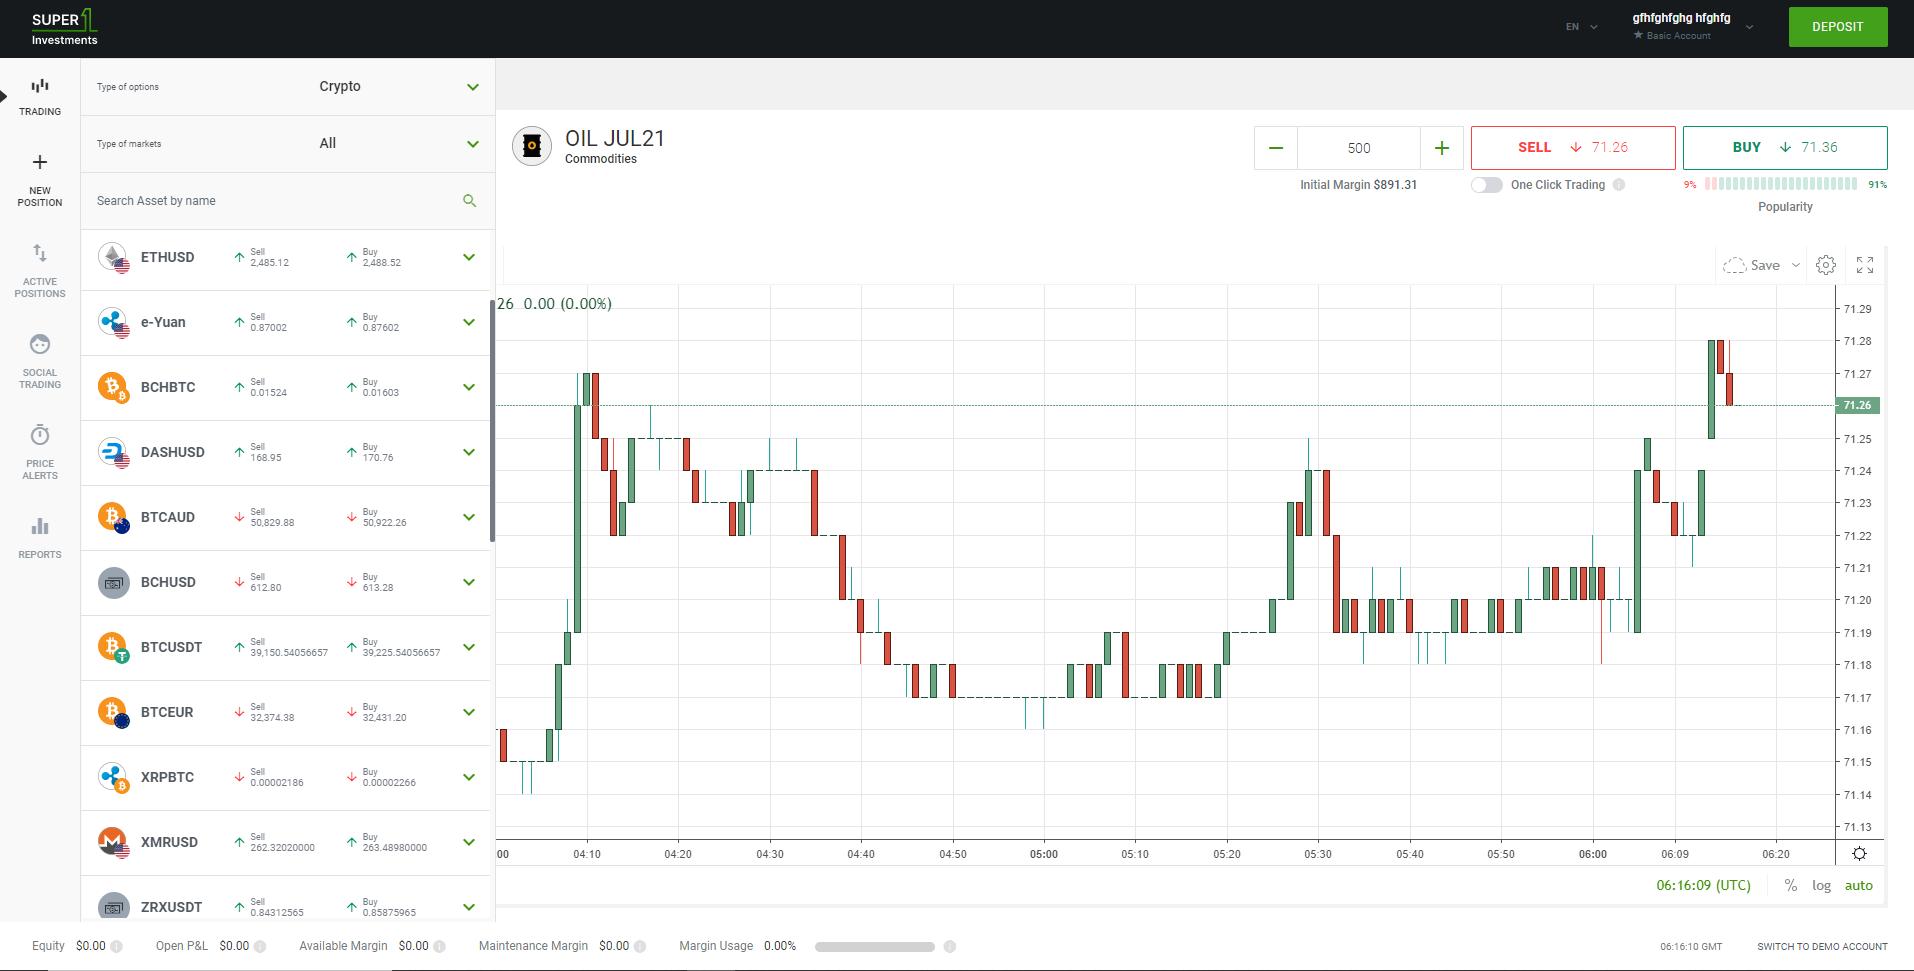 Super1Investments web trading platform